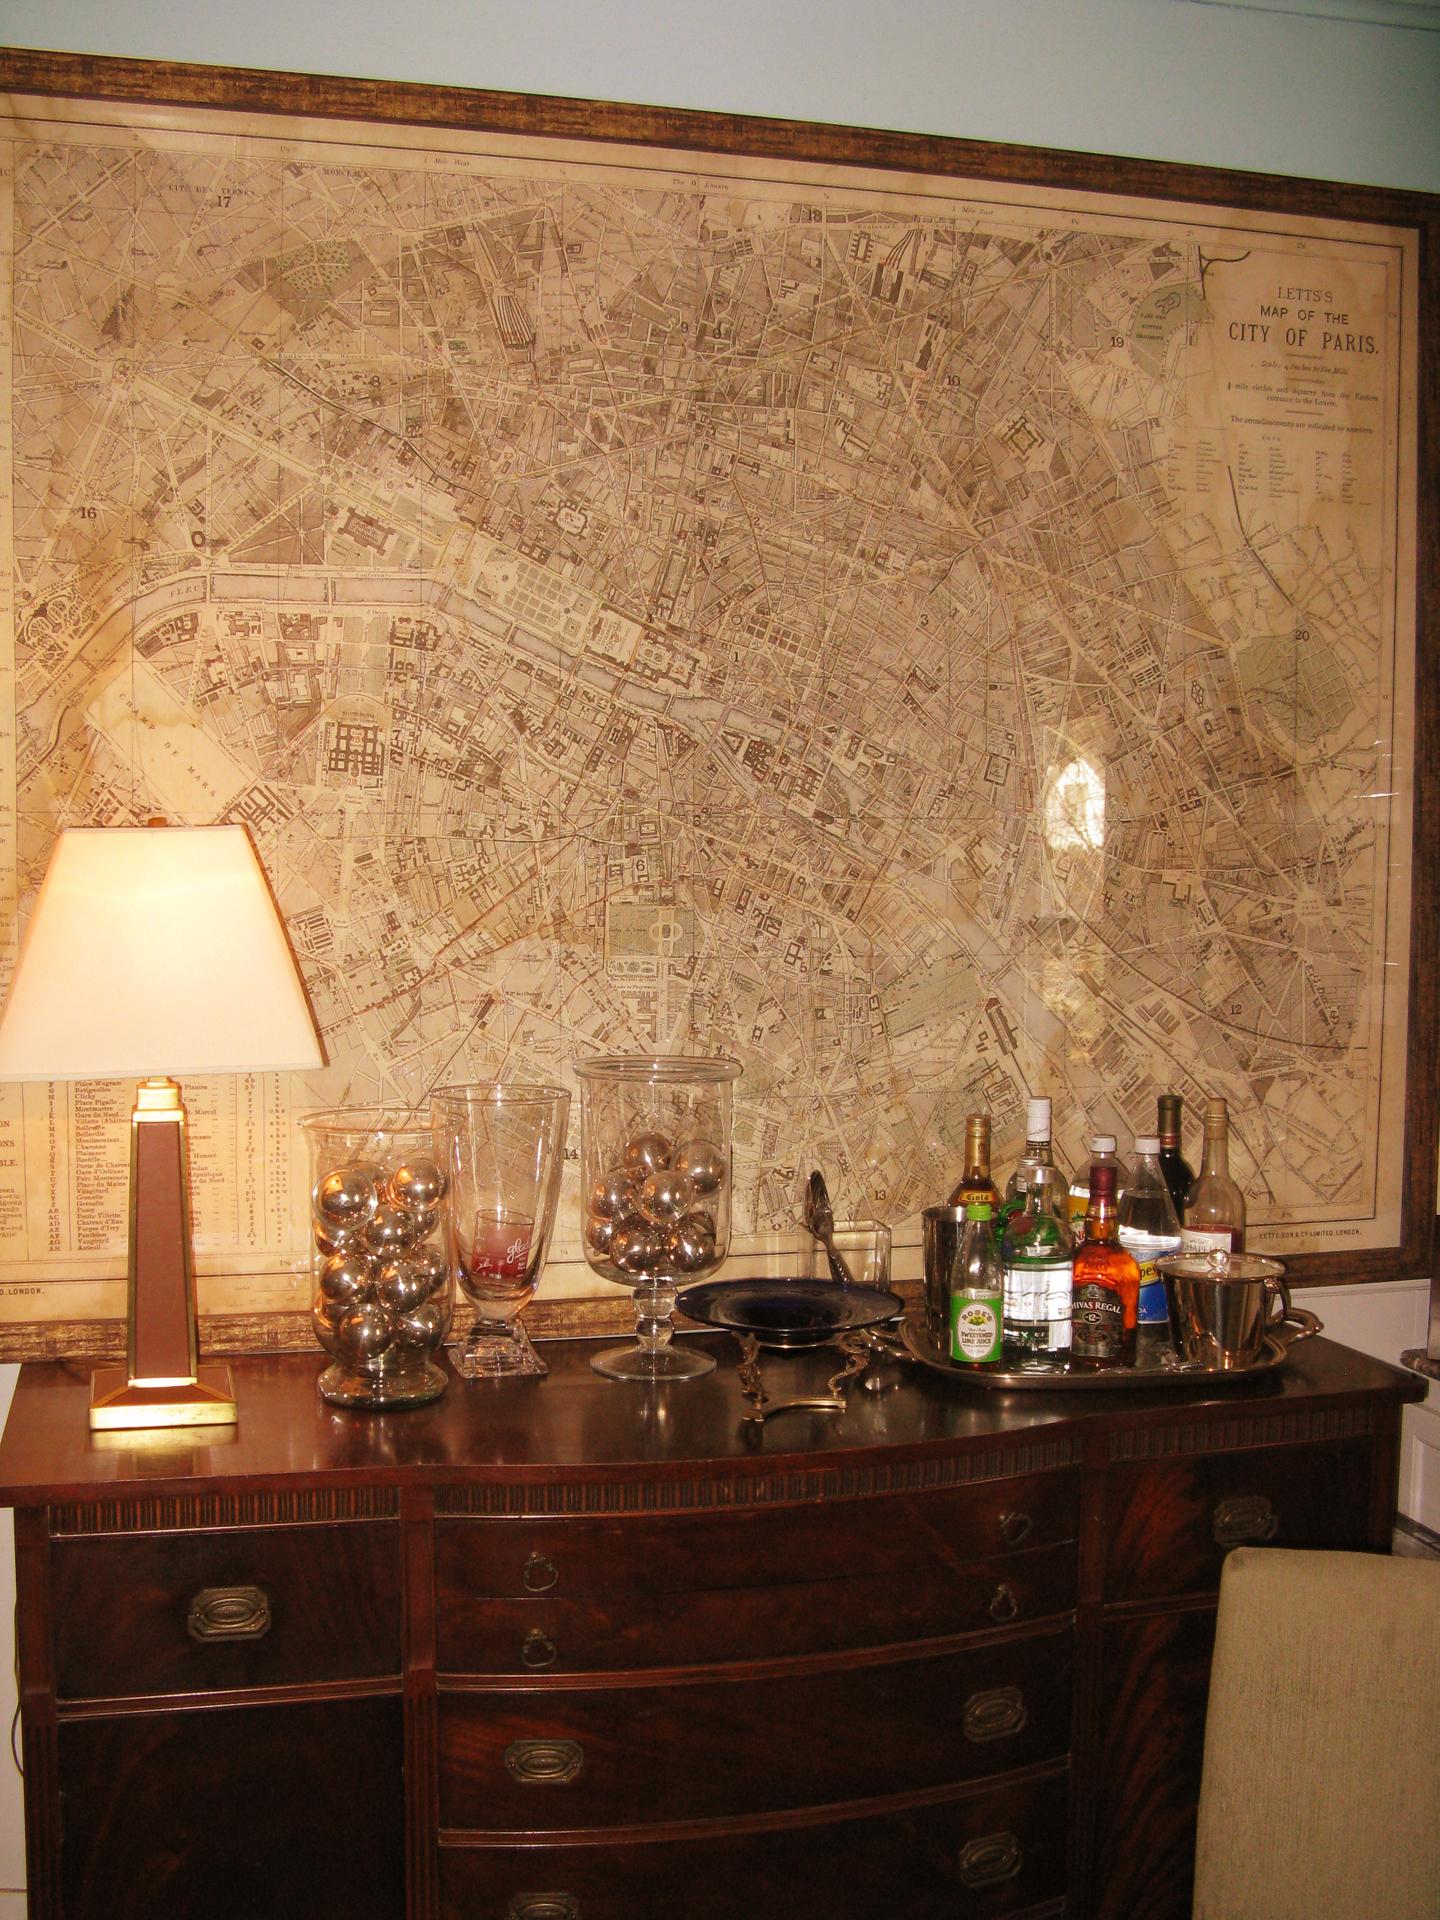 Living A Fulfilled Life - Restoration hardware paris map